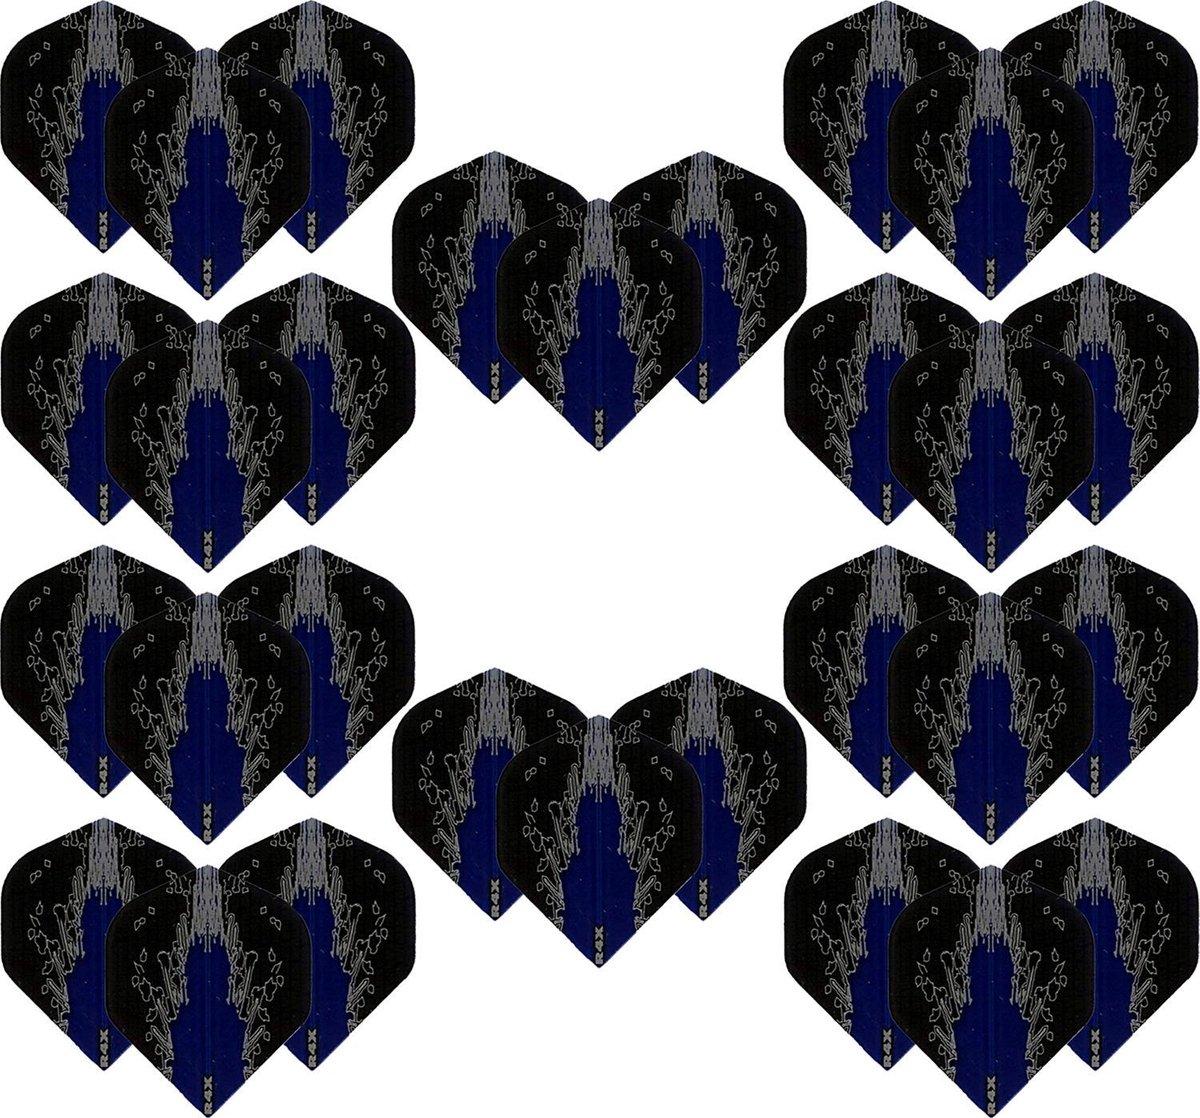 Dragon Darts - High Impact - 10 sets (30 stuks) - darts flights - Best Getest - Blauw